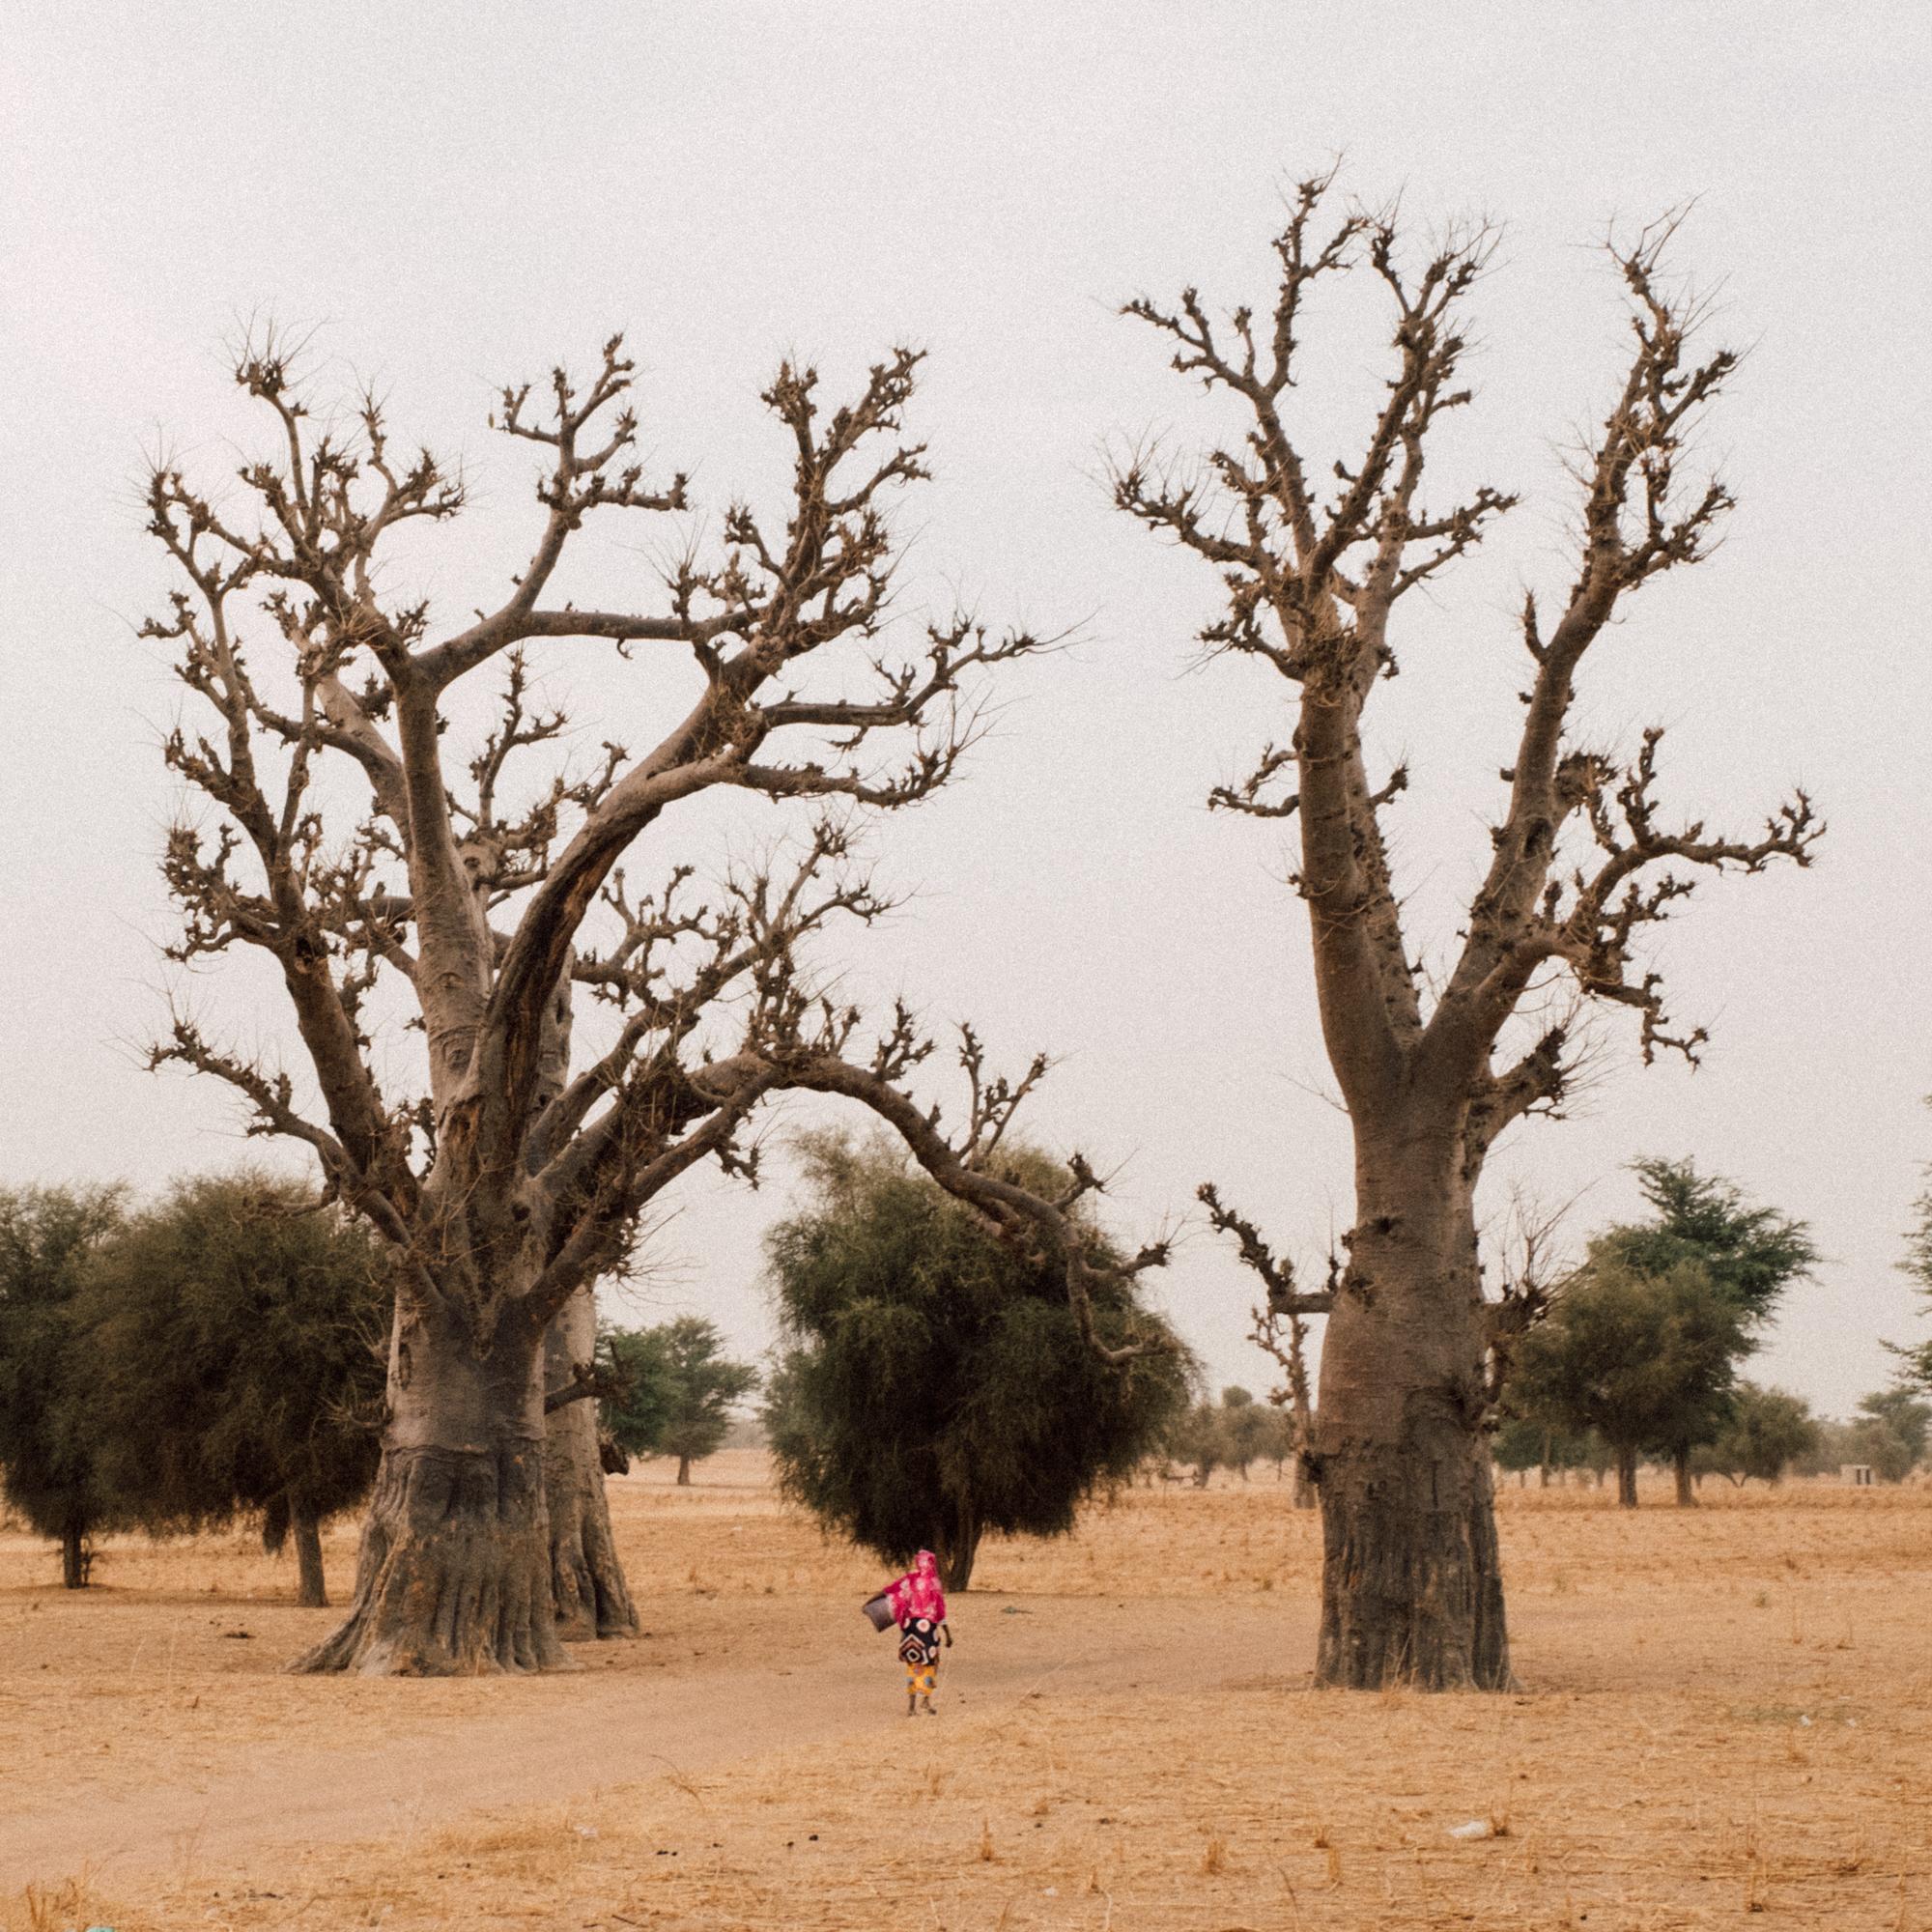 020517_Senegal_Day_3-44.jpg